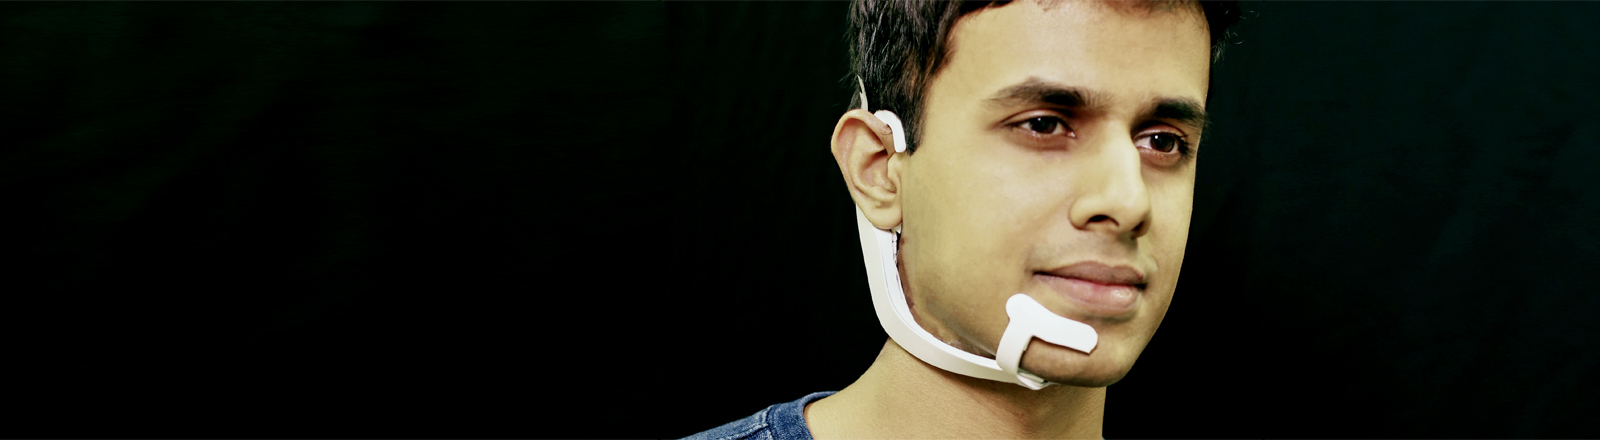 Entwickler der Forschungsgruppe mit Alterego-Headset